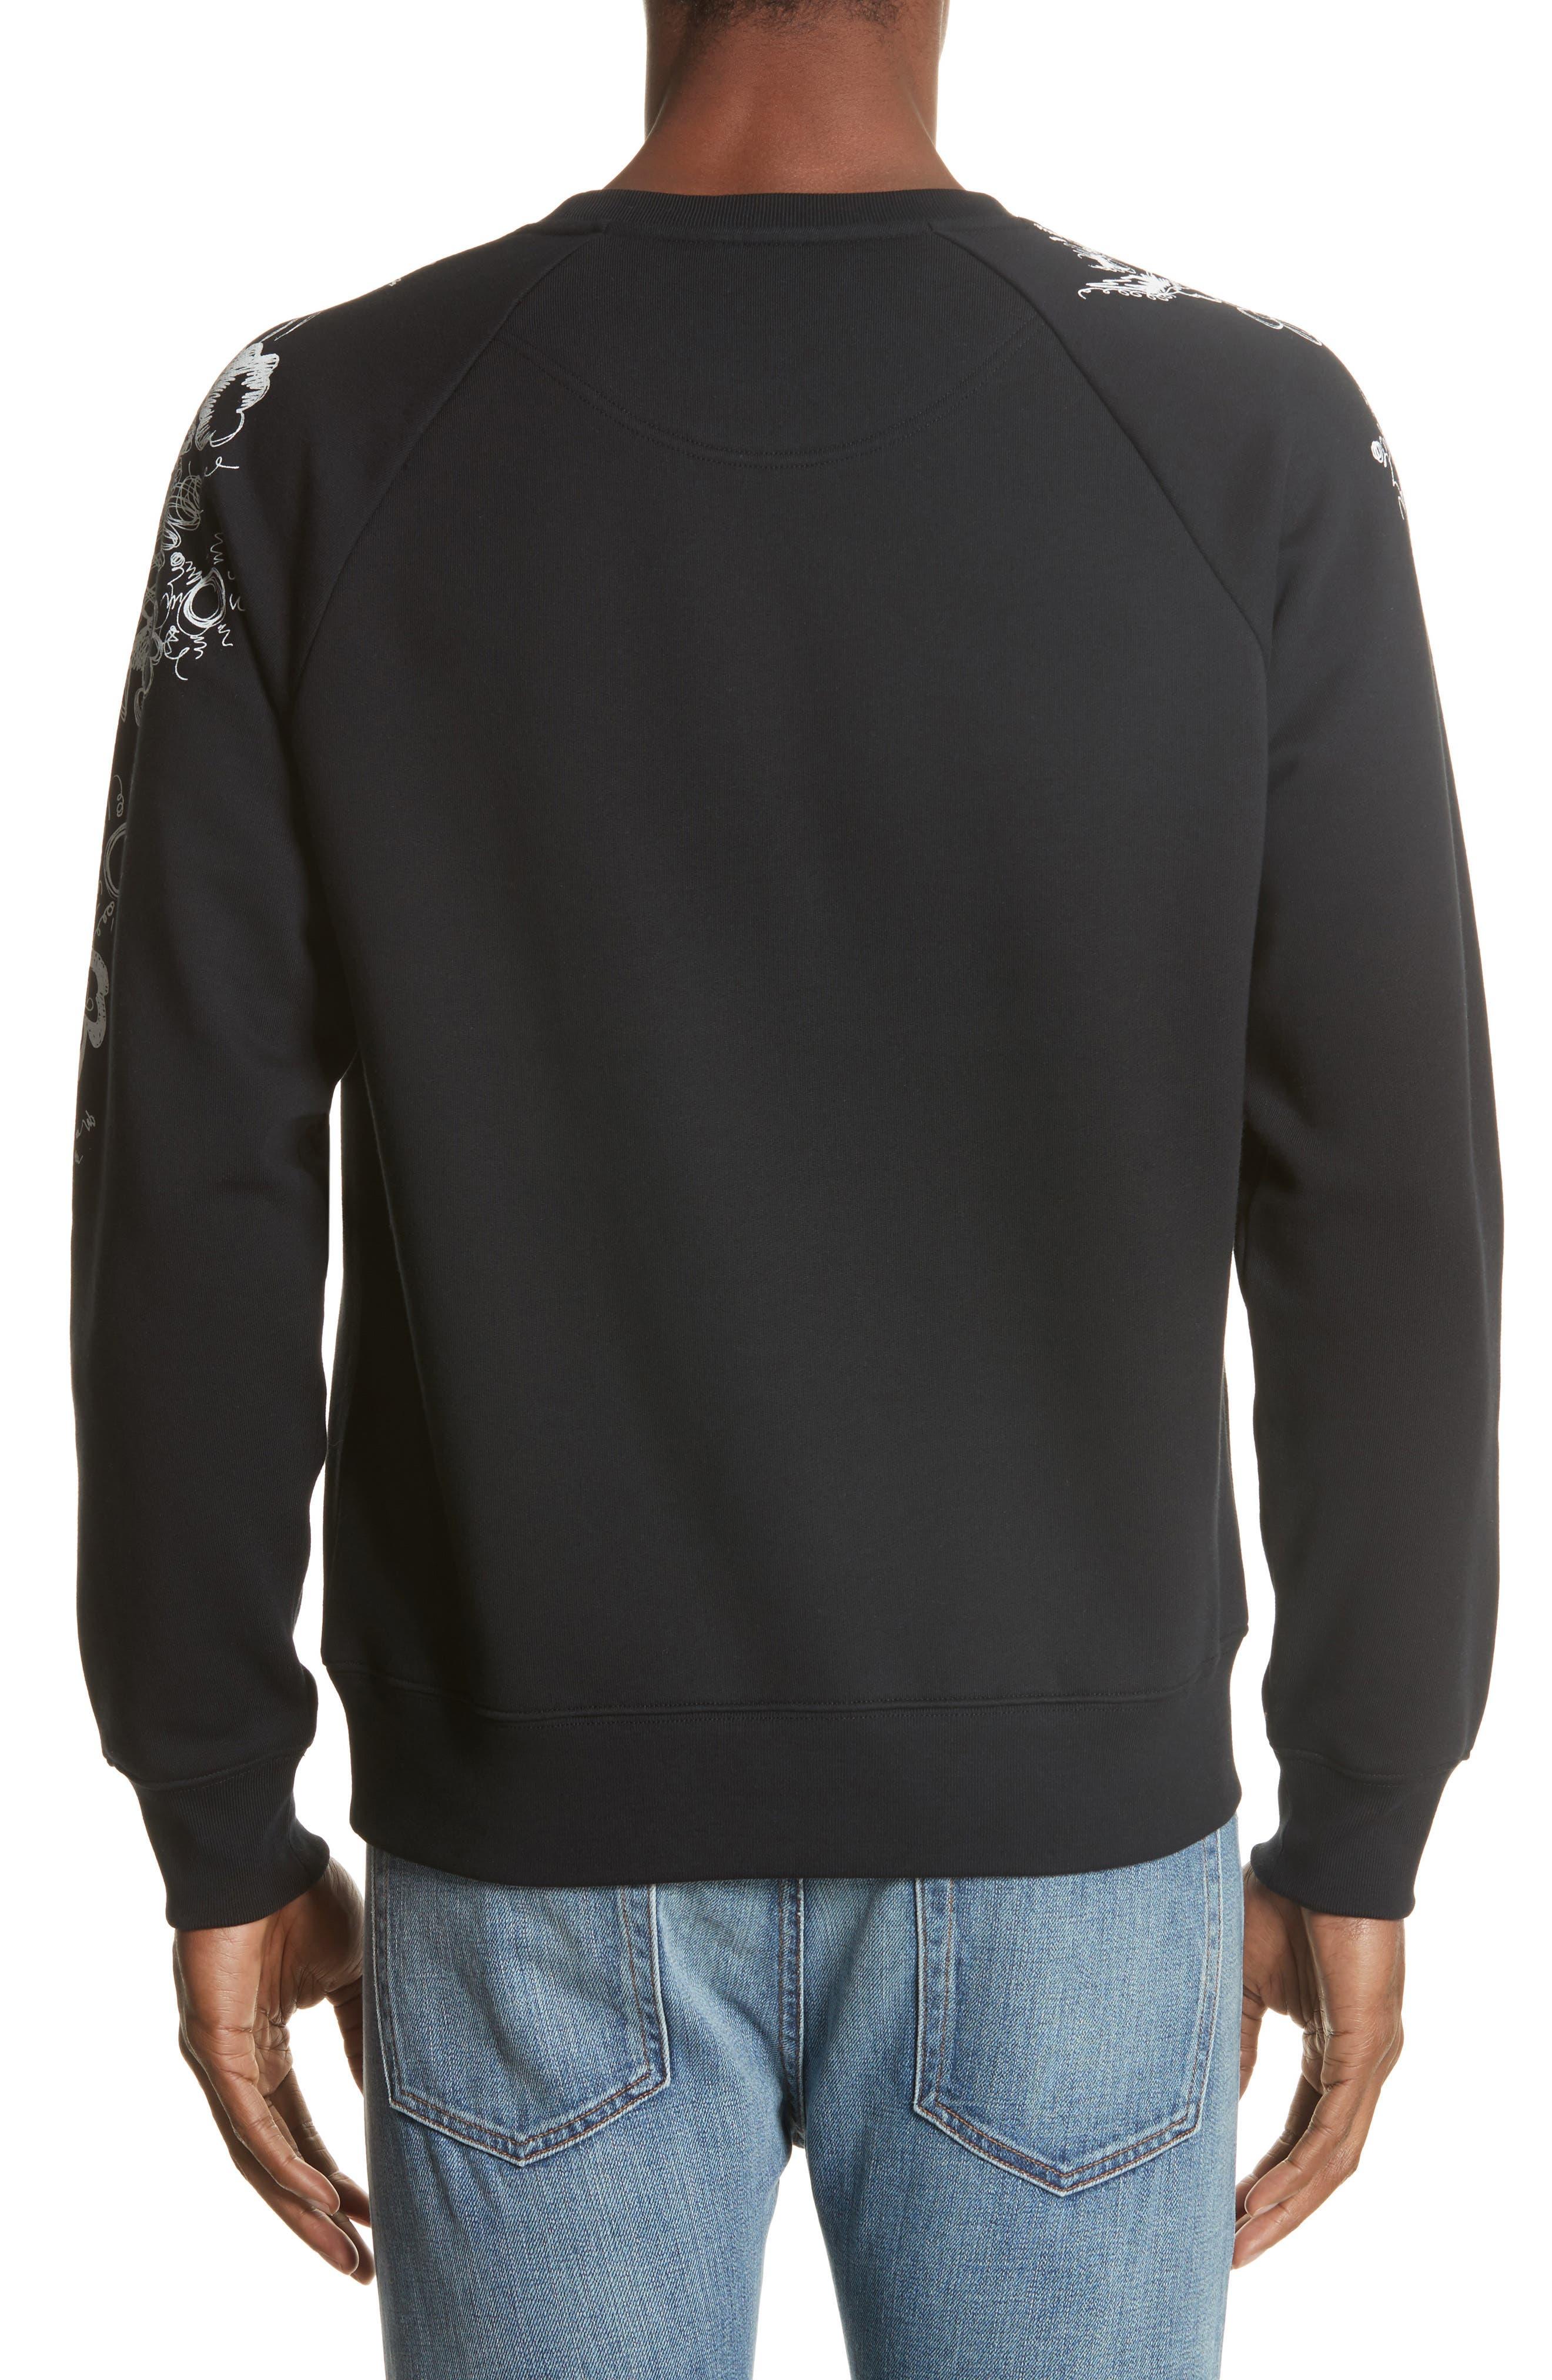 Barford Crewneck Sweatshirt,                             Alternate thumbnail 2, color,                             Black